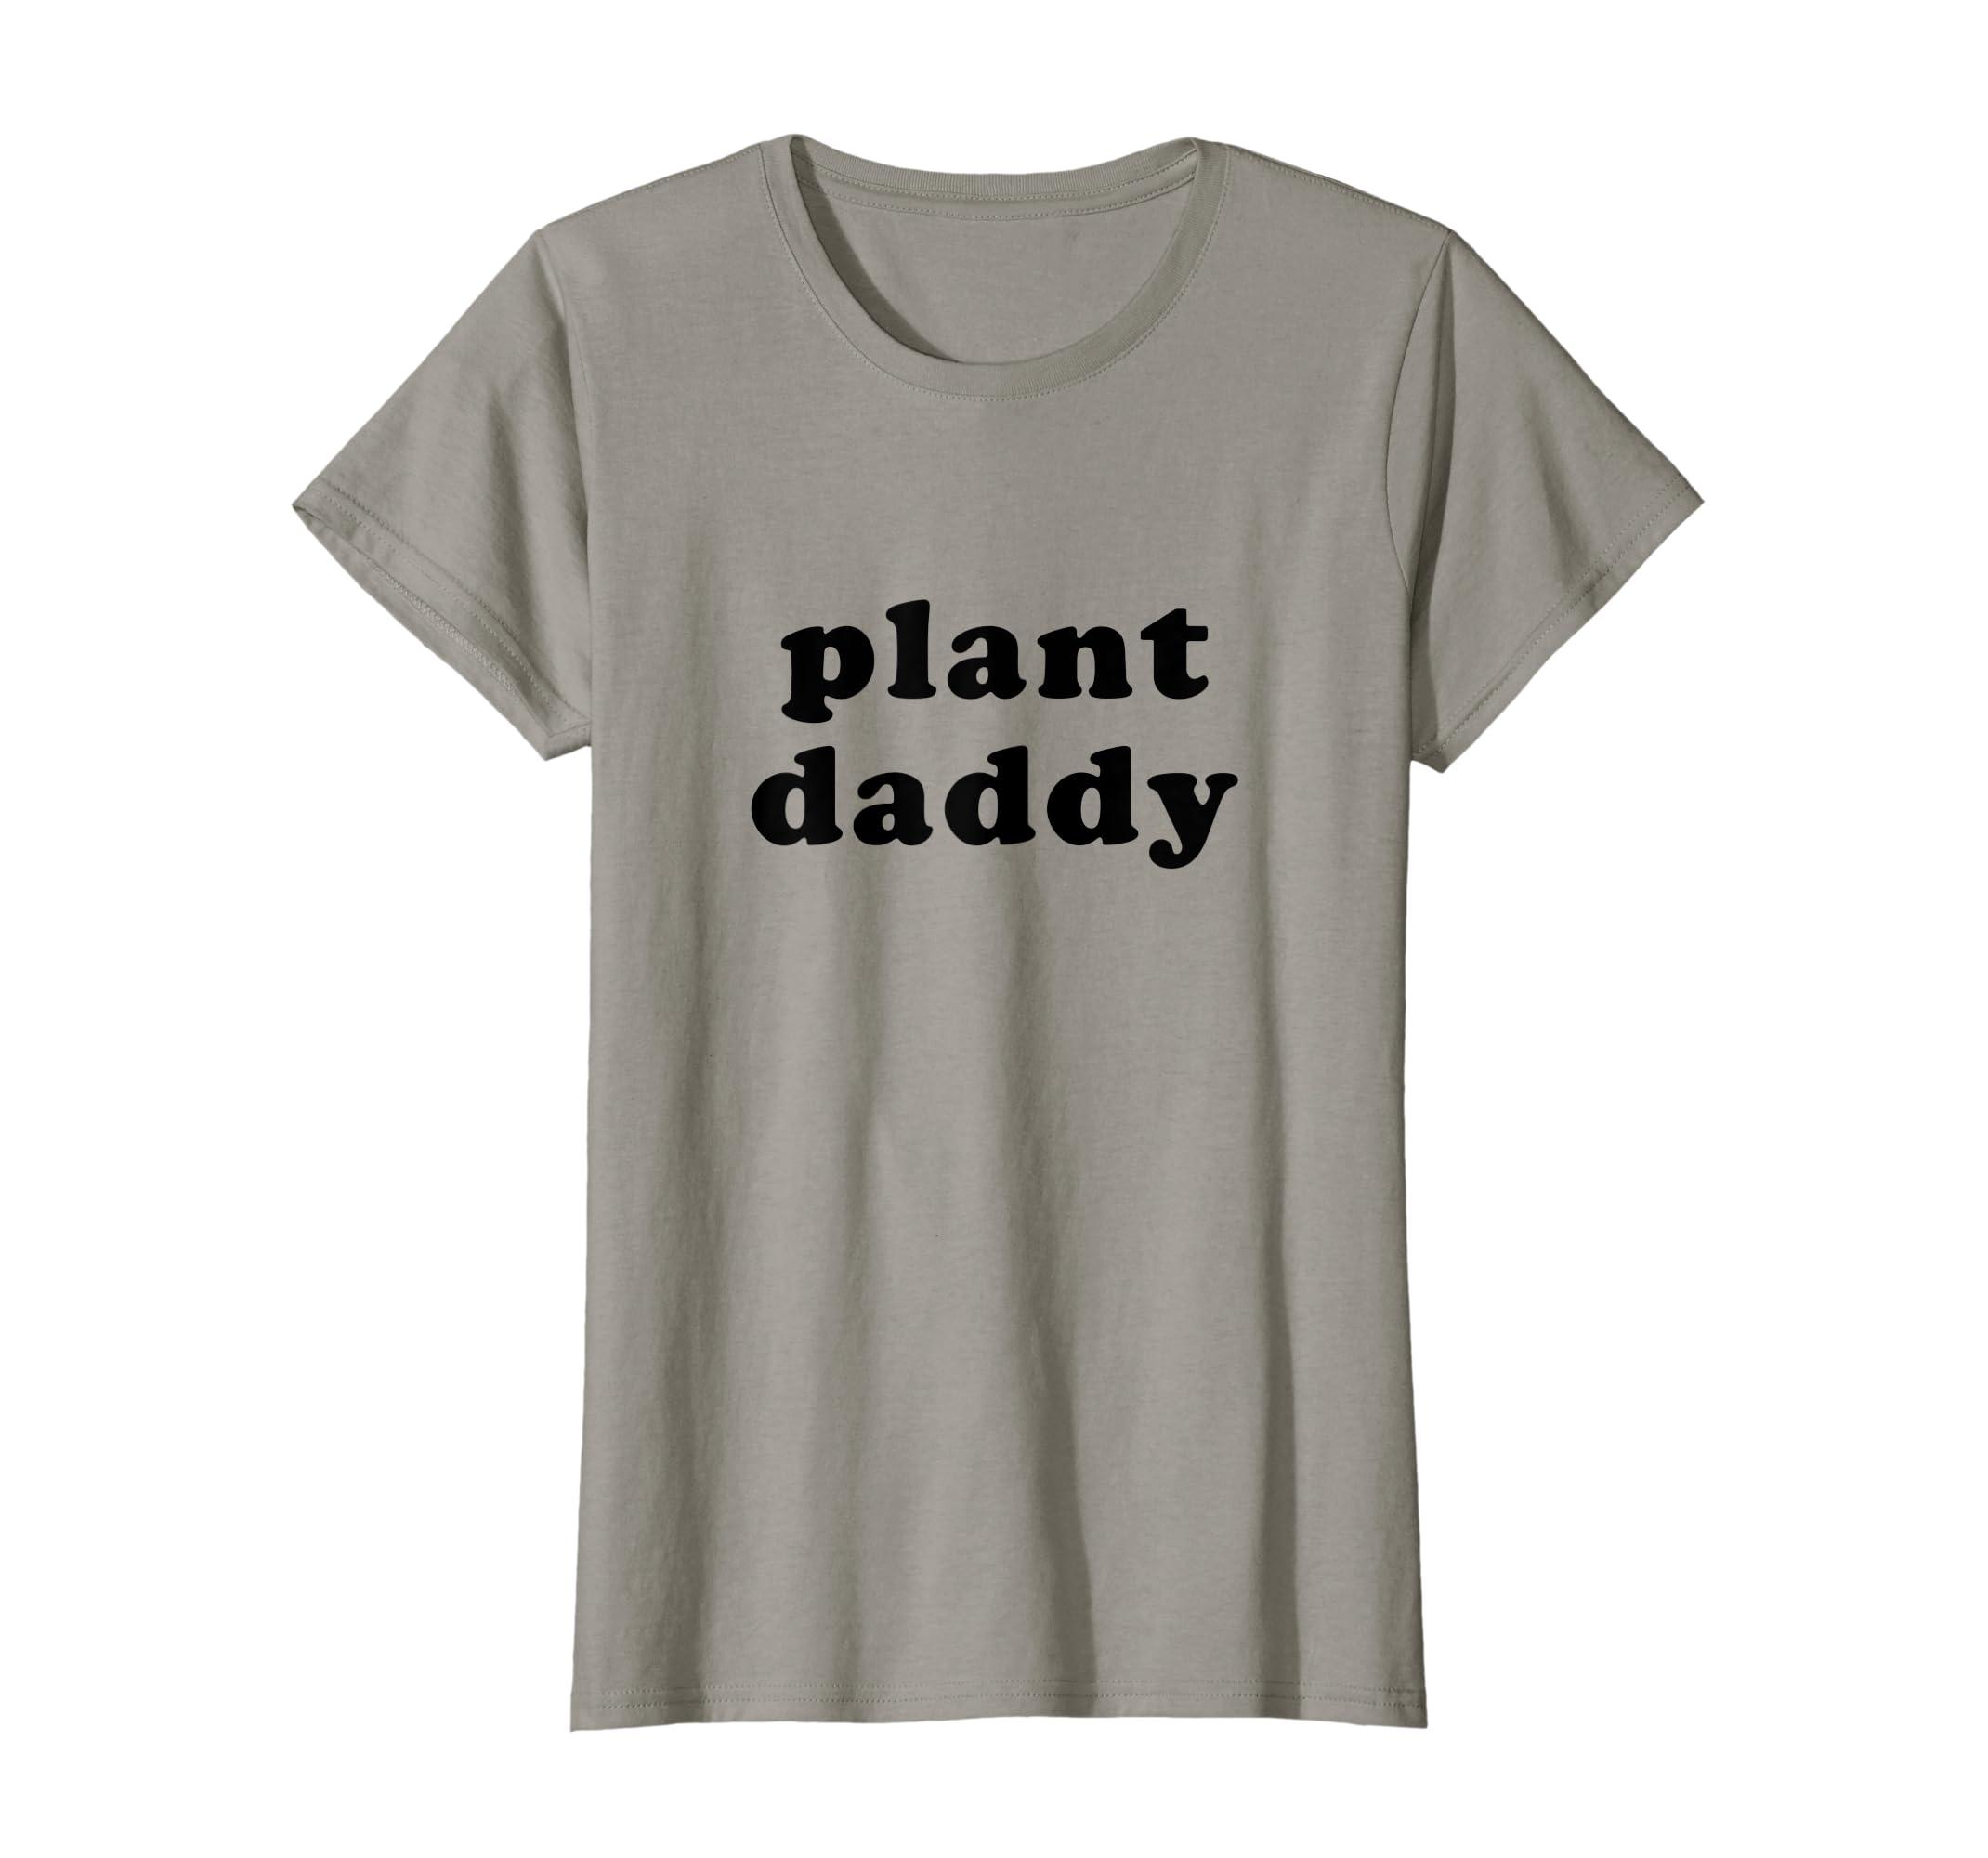 bab9e1c0 Amazon.com: Mens Plant Daddy Shirt Funny Gardening T-Shirt Fathers Day:  Clothing